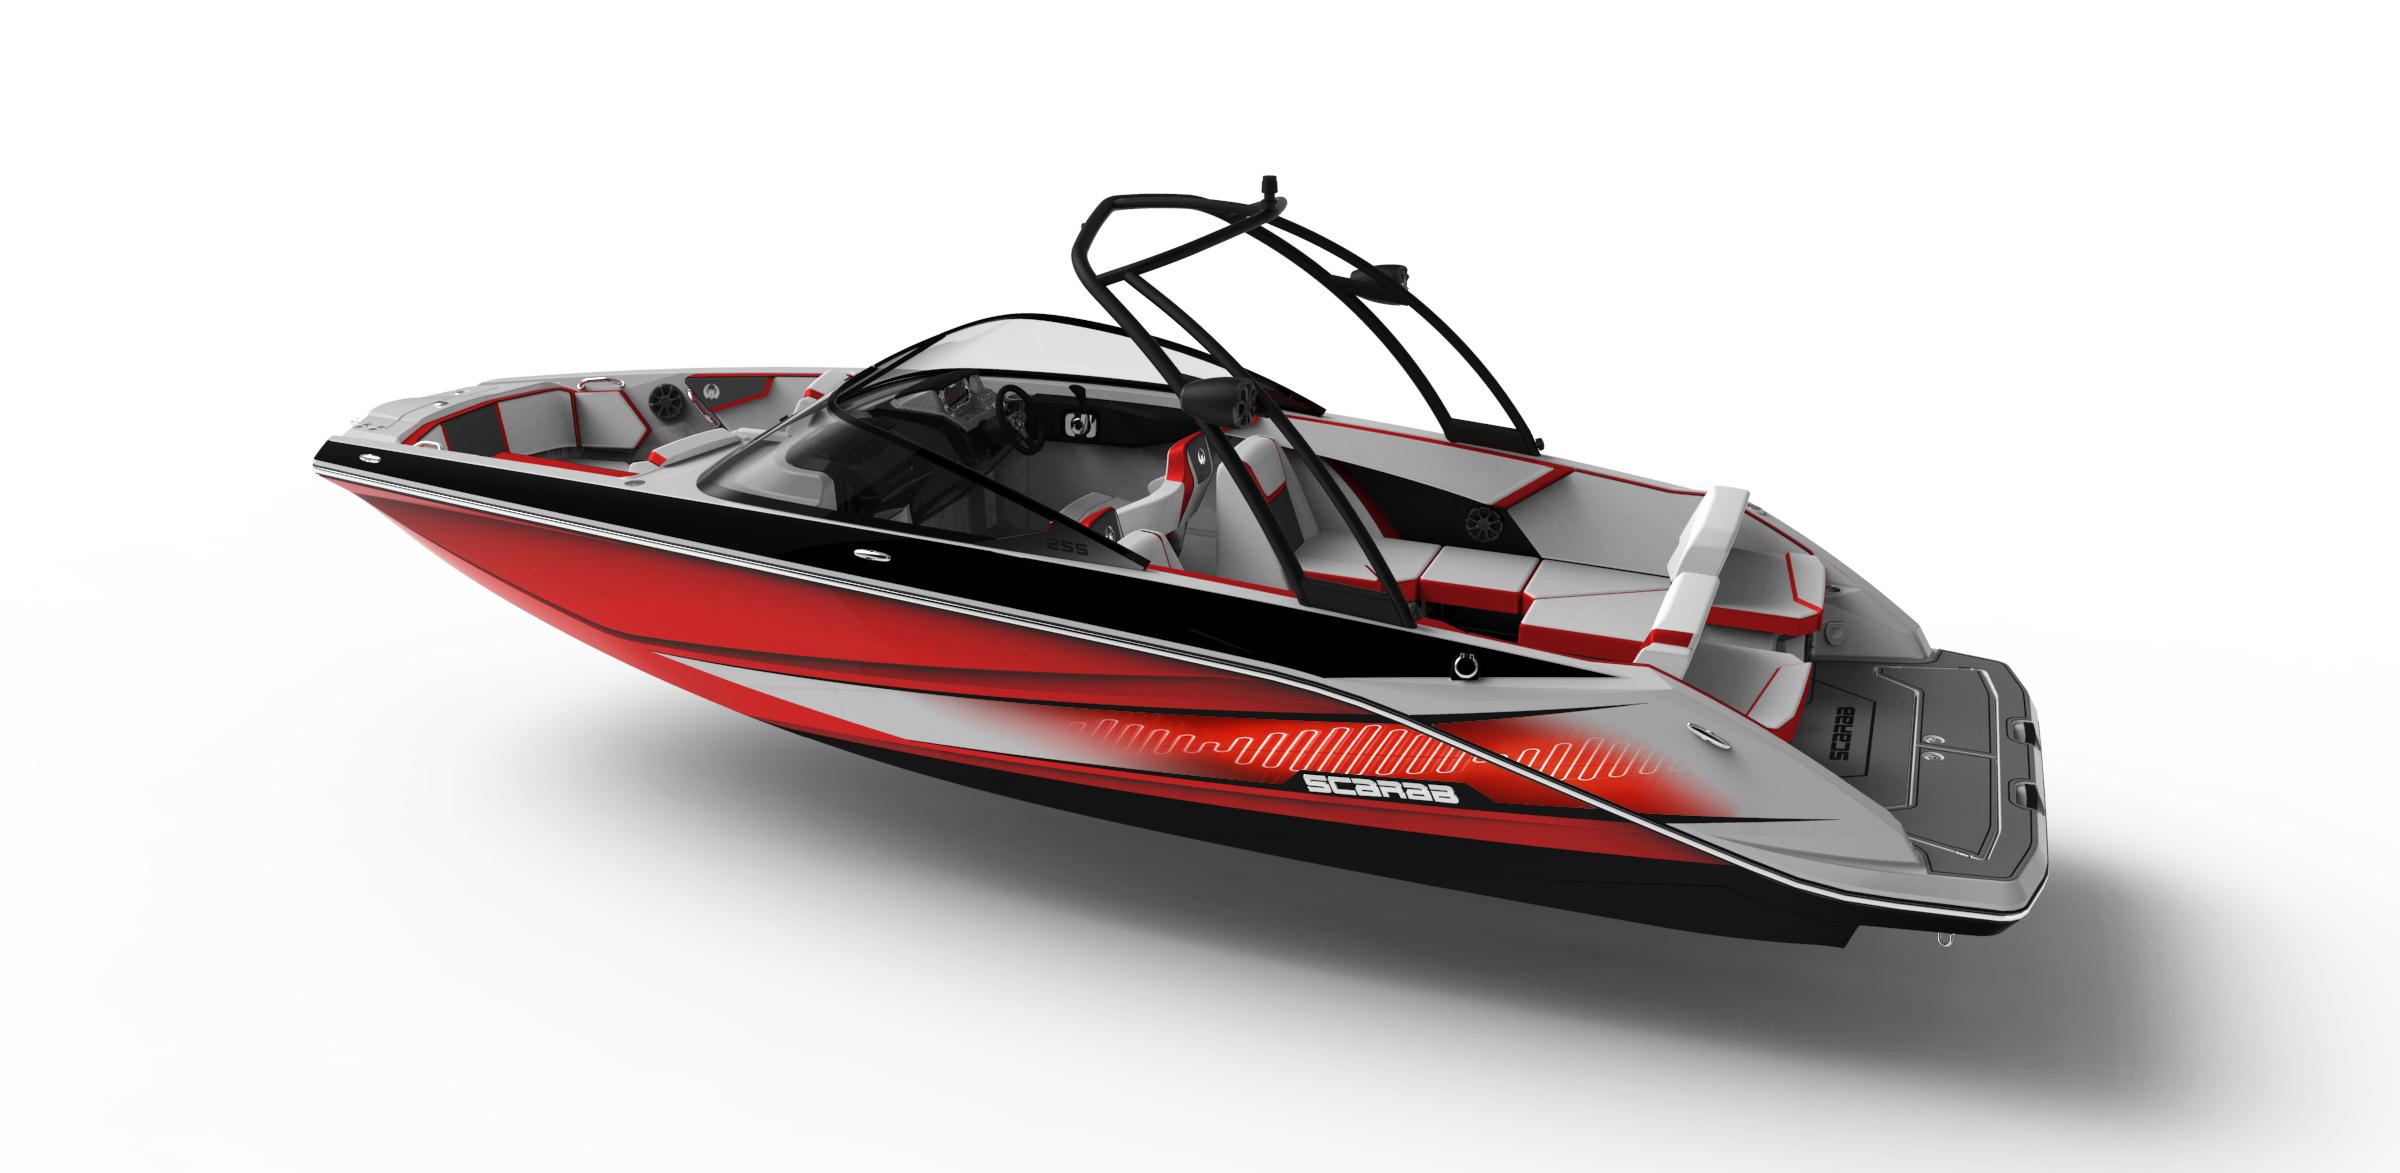 Jet Boats For Sale: 3 Top Picks - boats com